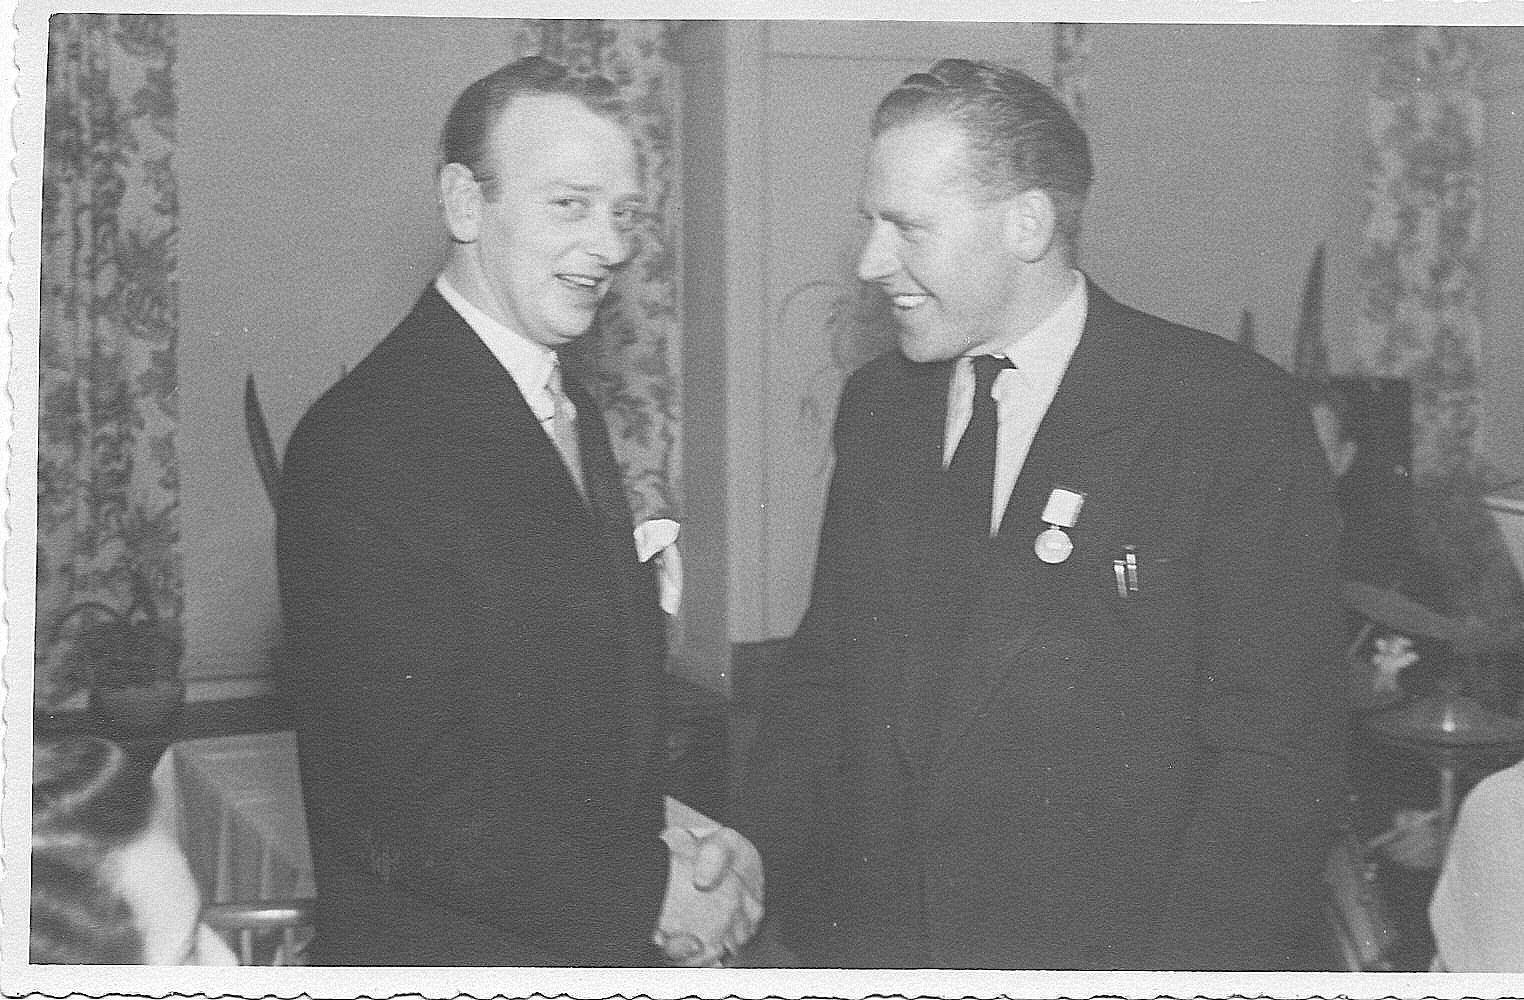 Poul Sørensen tv lykønsker Carlo Sejer med hans DM i Hobro 1949 ved en klubaften januar 1950.